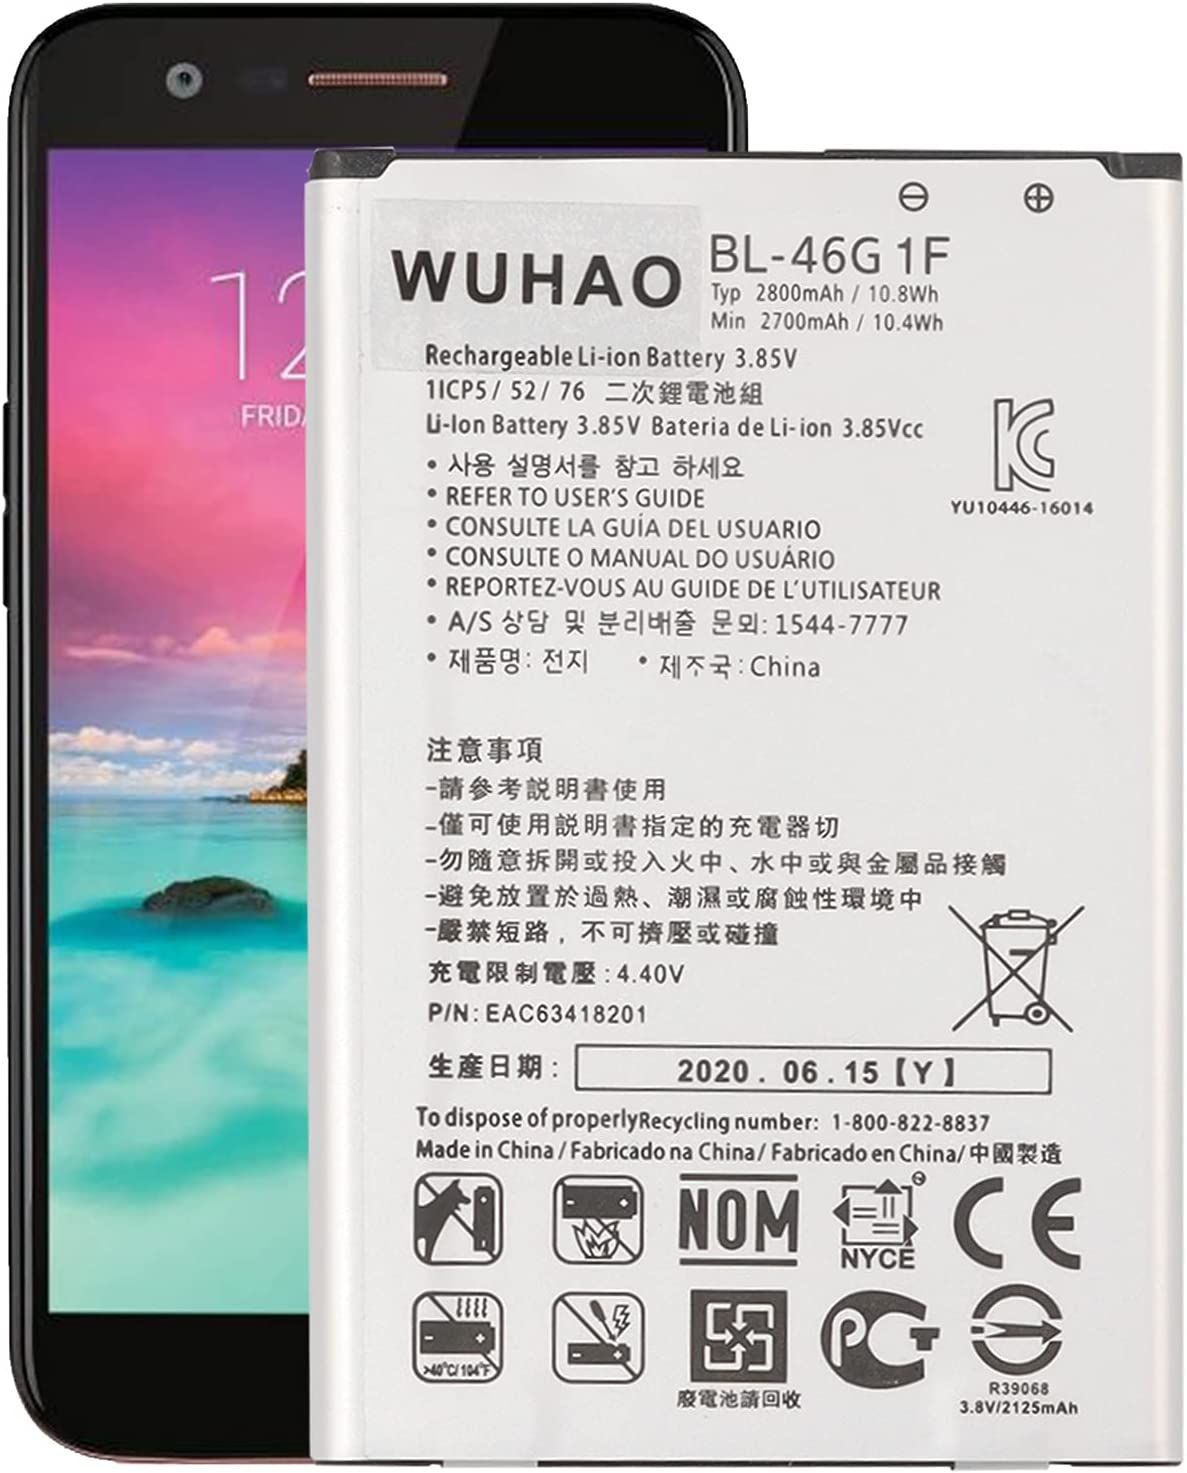 Replacement Battery BL-46G1F for Elegant M255 ATT LG List price K20